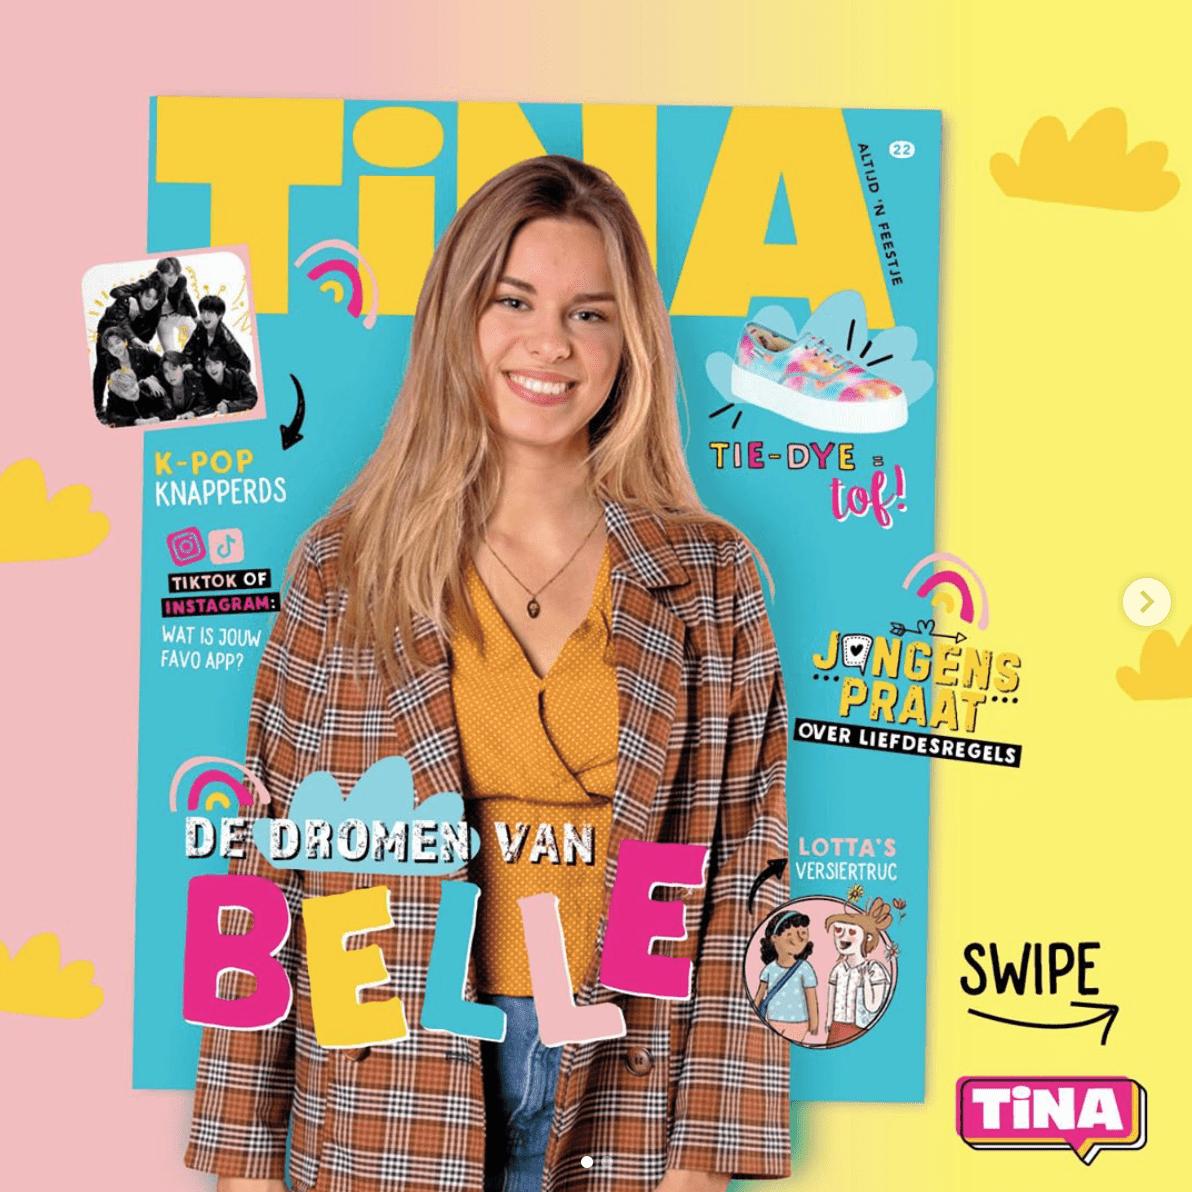 tina-tijdschrift-cover-belle-zimmerman